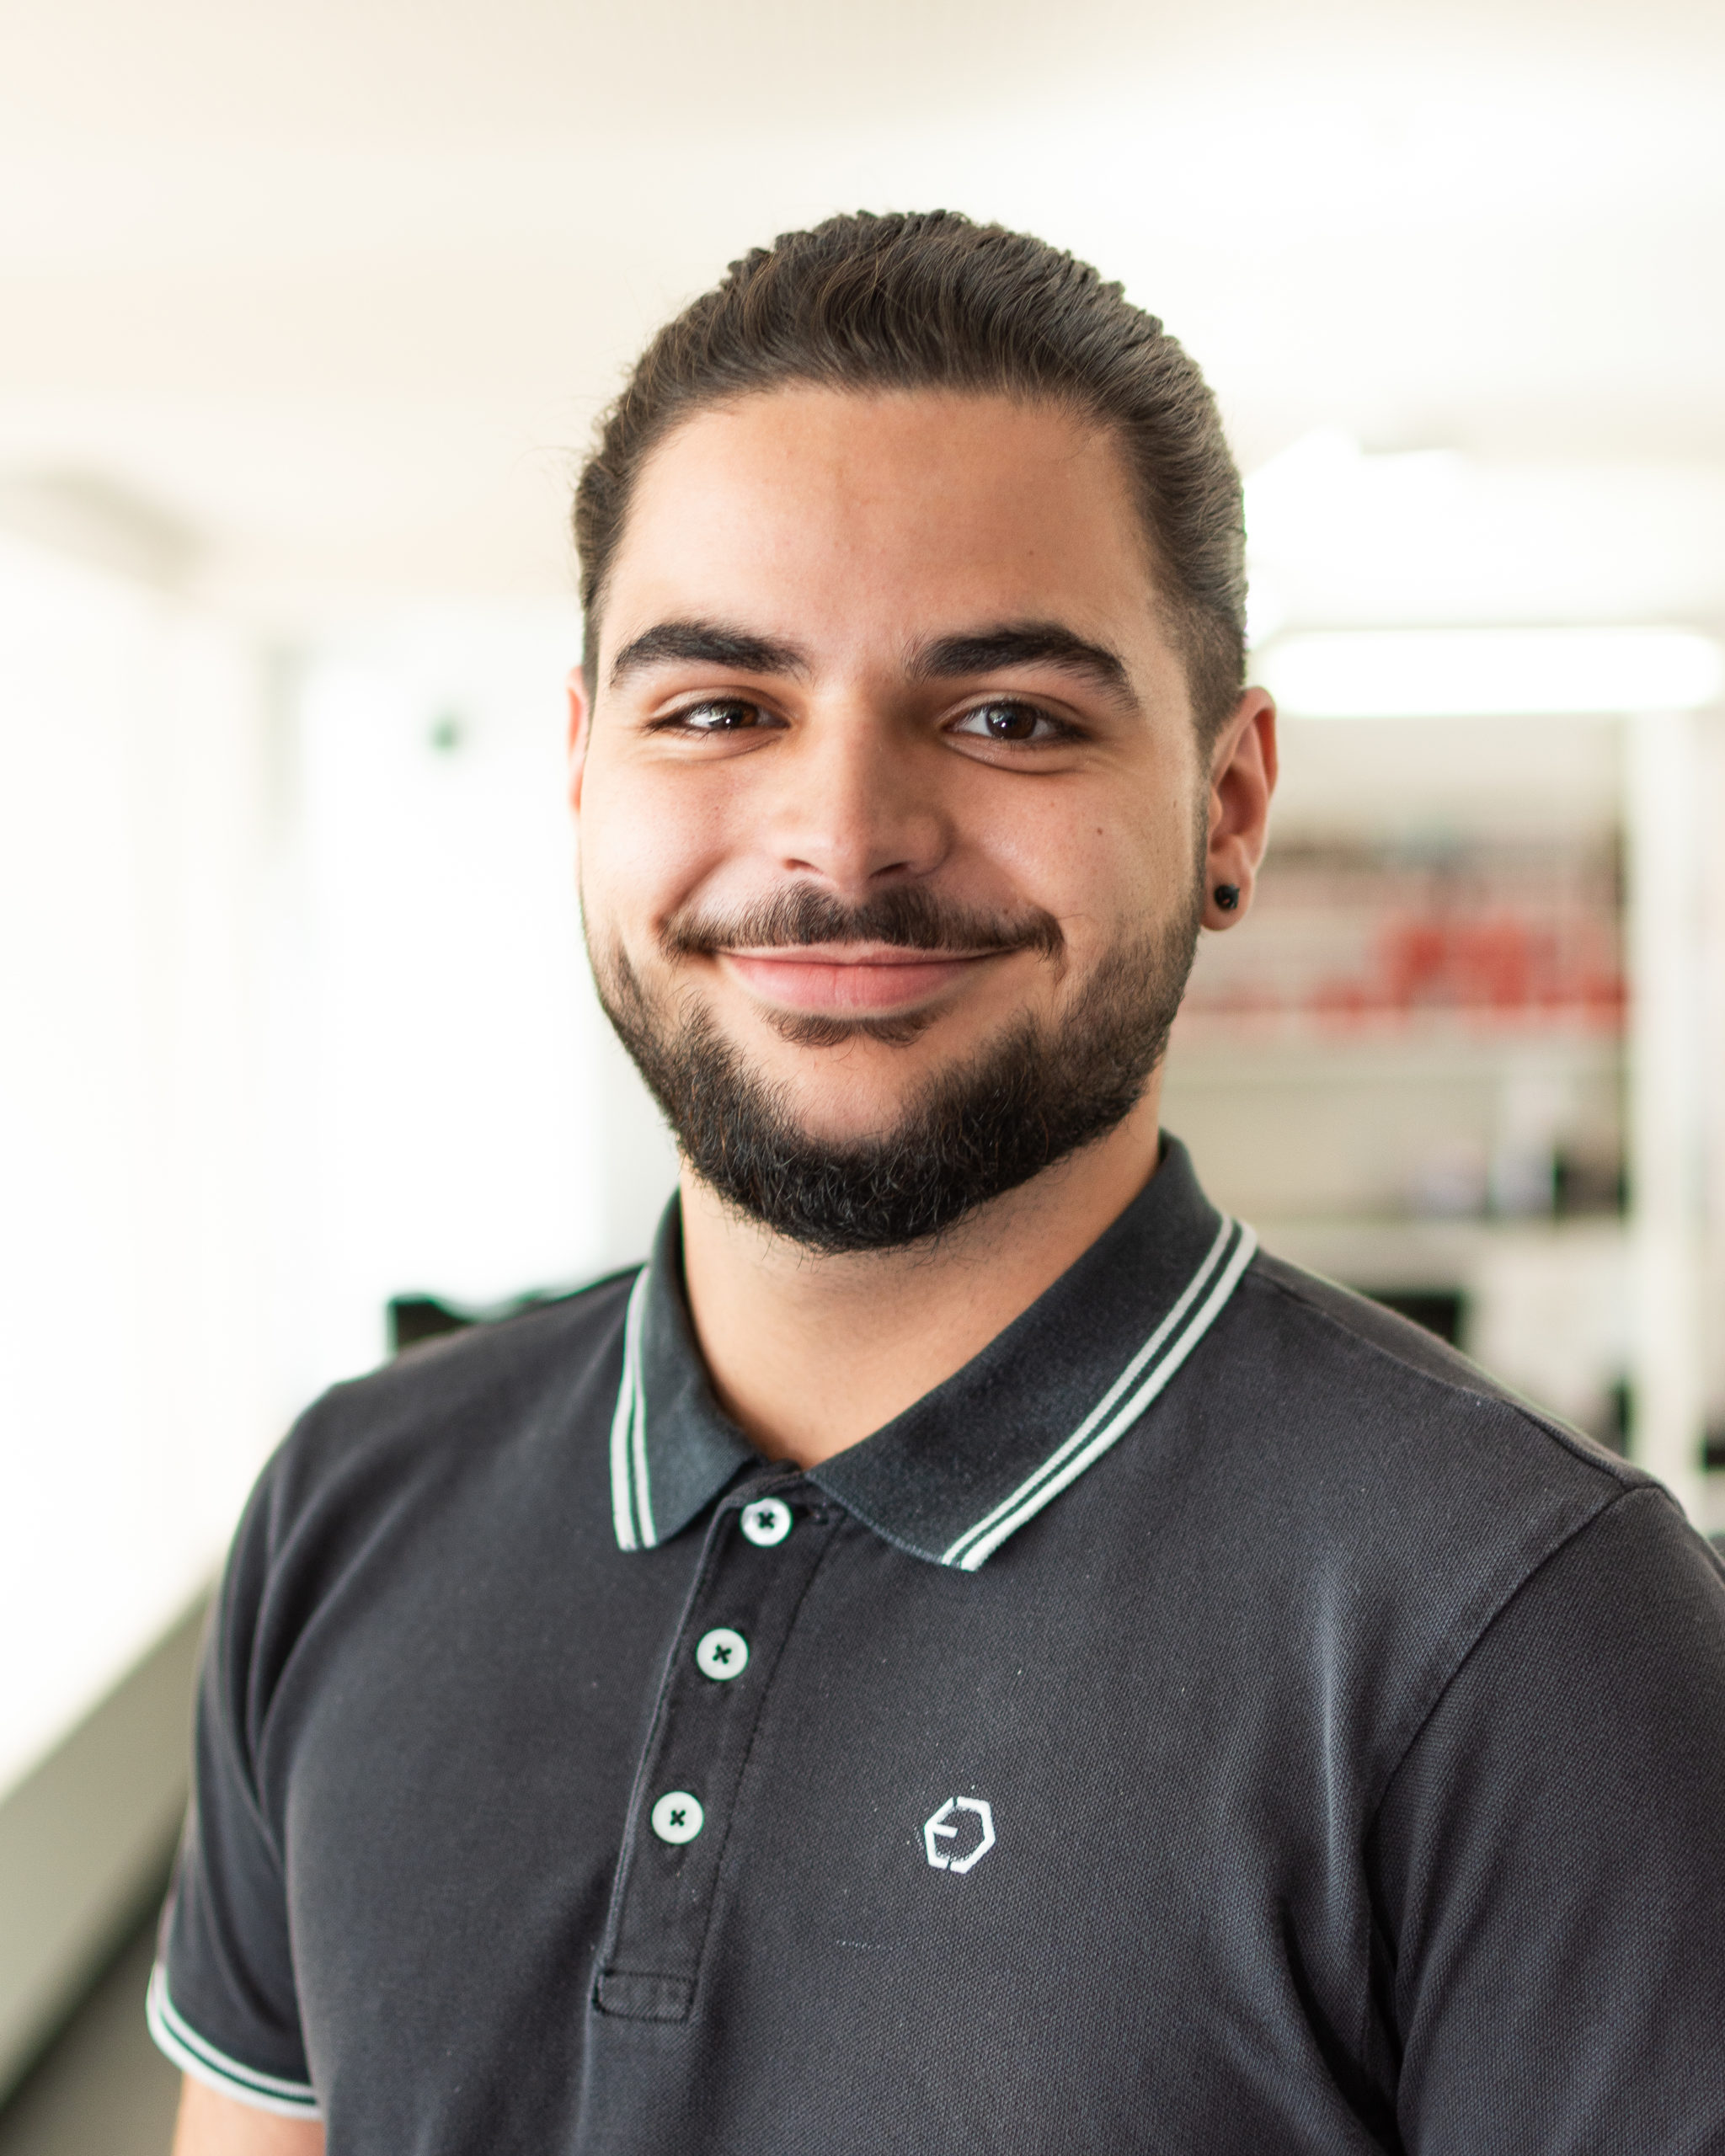 Rui-Pedro-Vieira-Valdares-Porträt